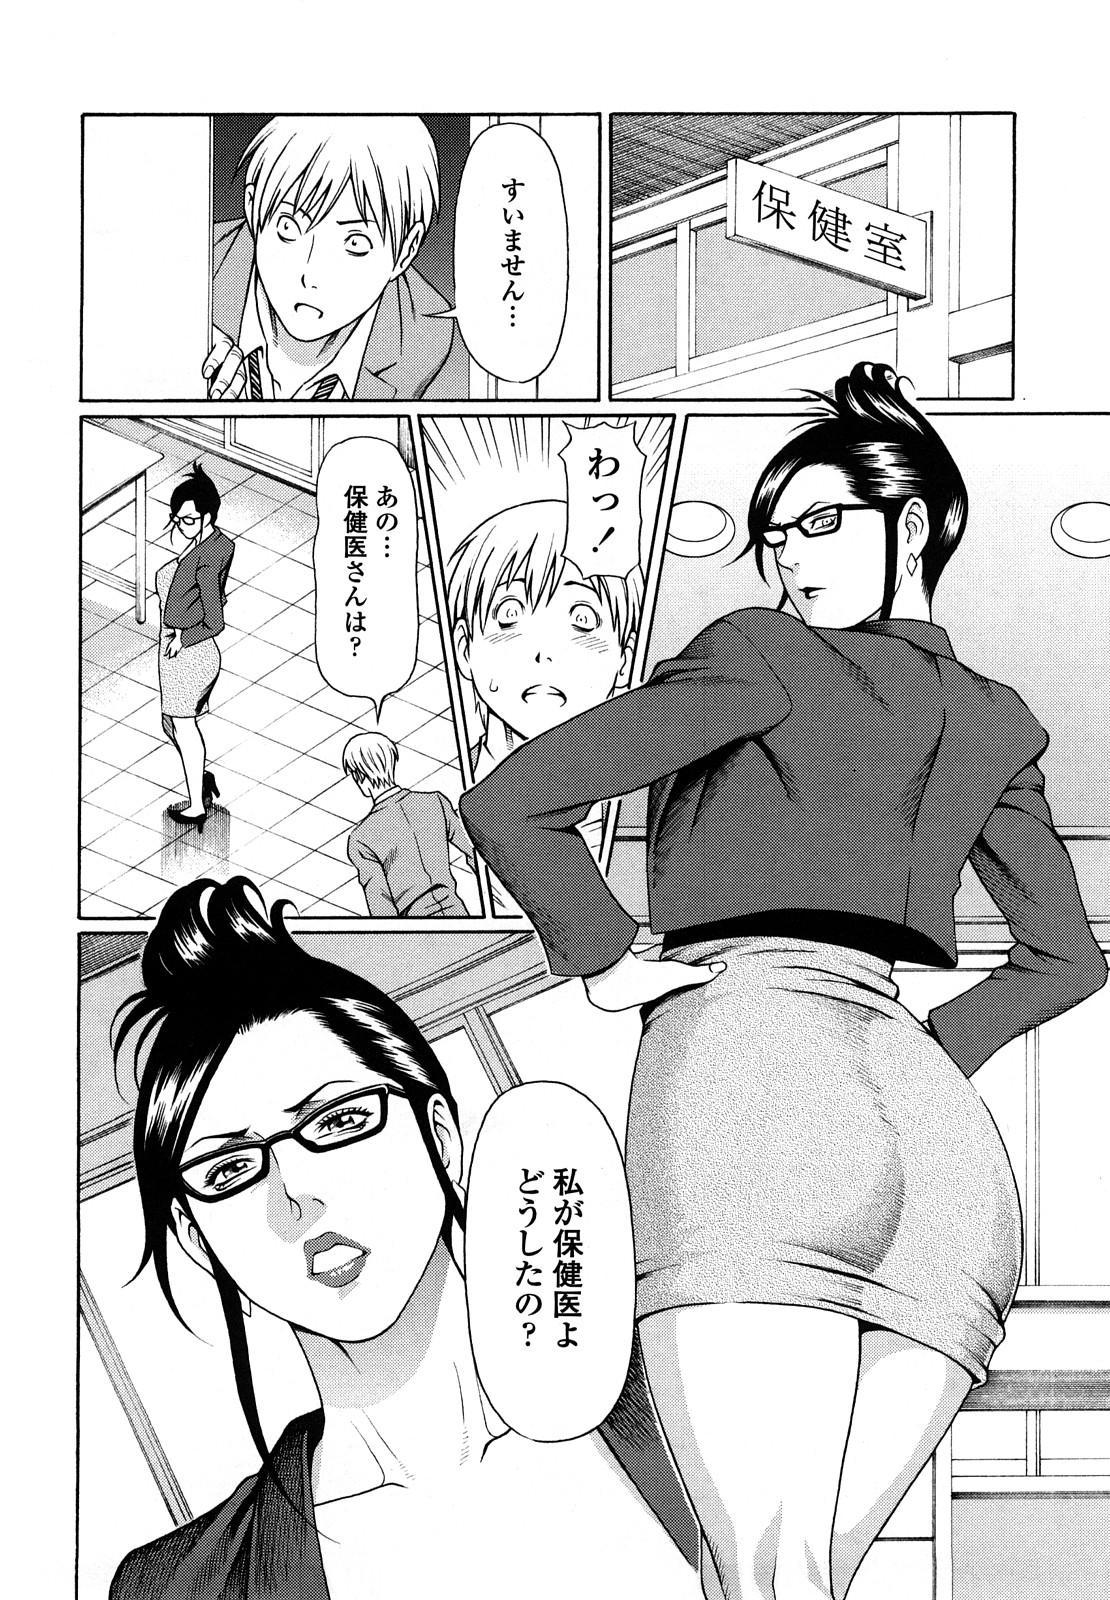 [Takasugi Kou] Kindan no Haha-Ana - Immorality Love-Hole [Decensored] 157